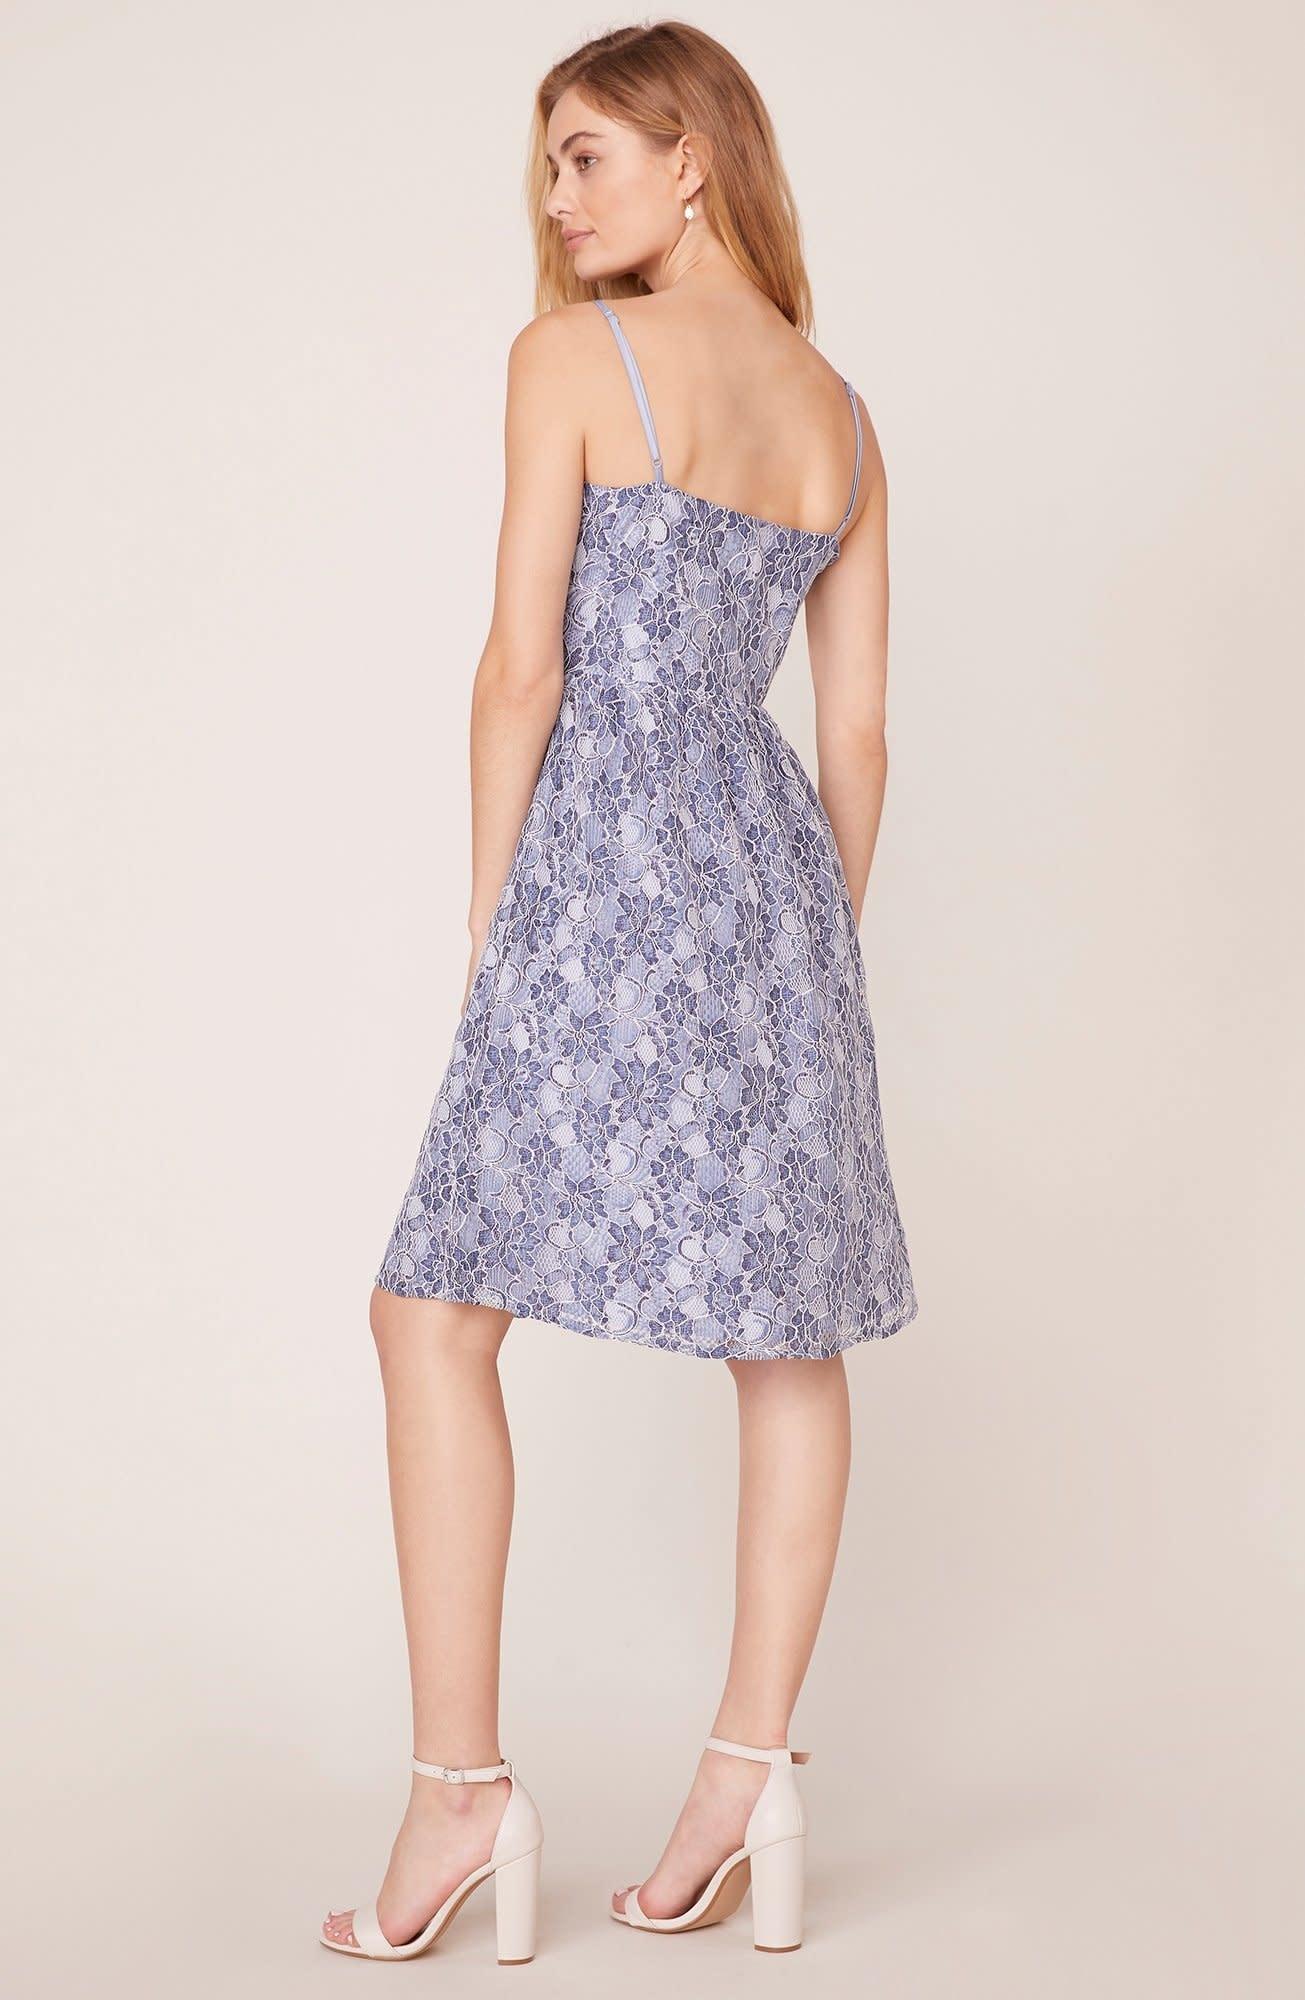 Jack by BB Dakota Sweet Life Two-Tone Lace Dress